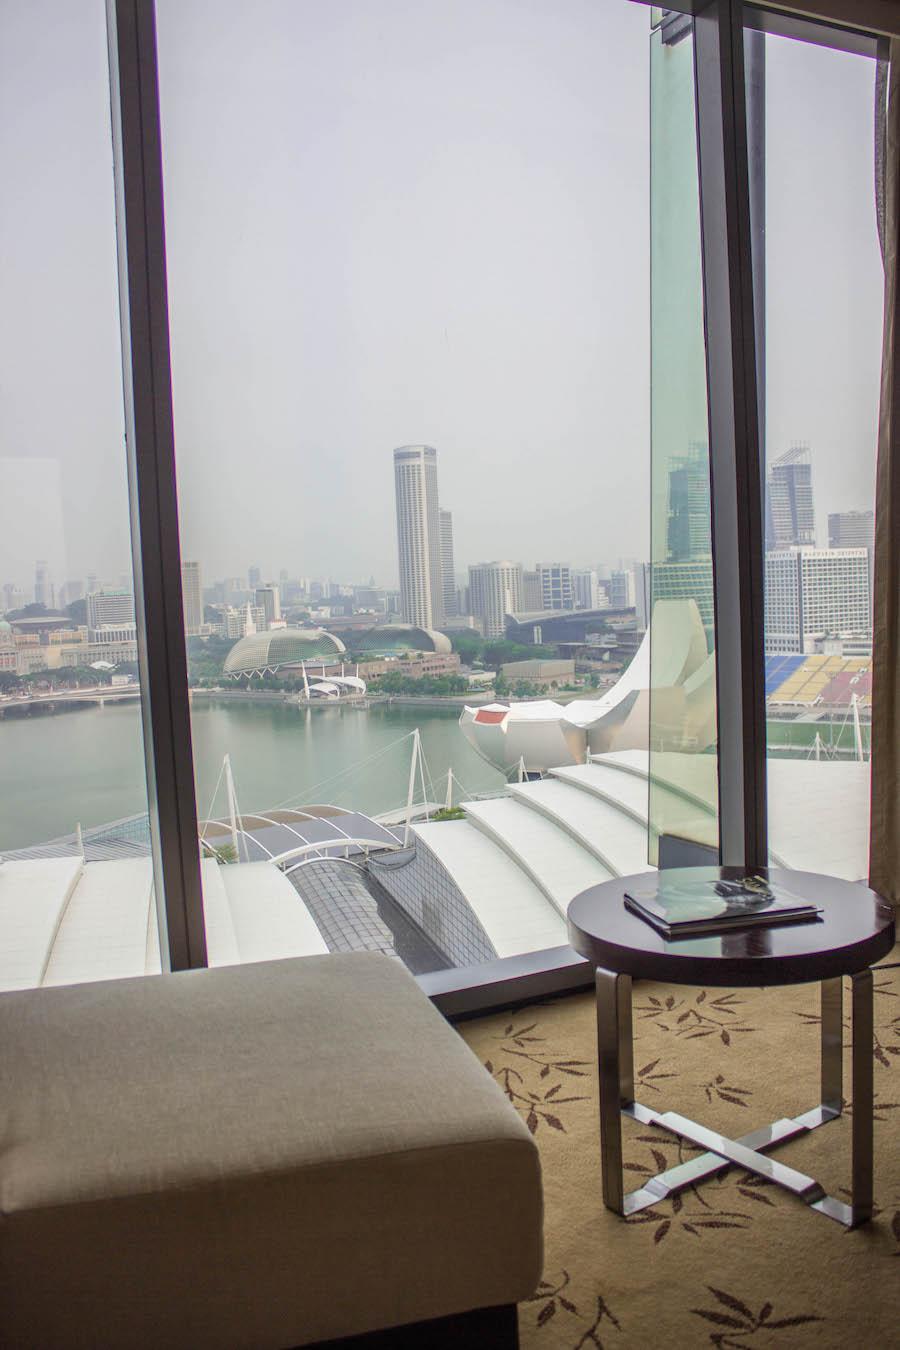 Marina Bay Sands Hotel Singapur Aussicht am Tag